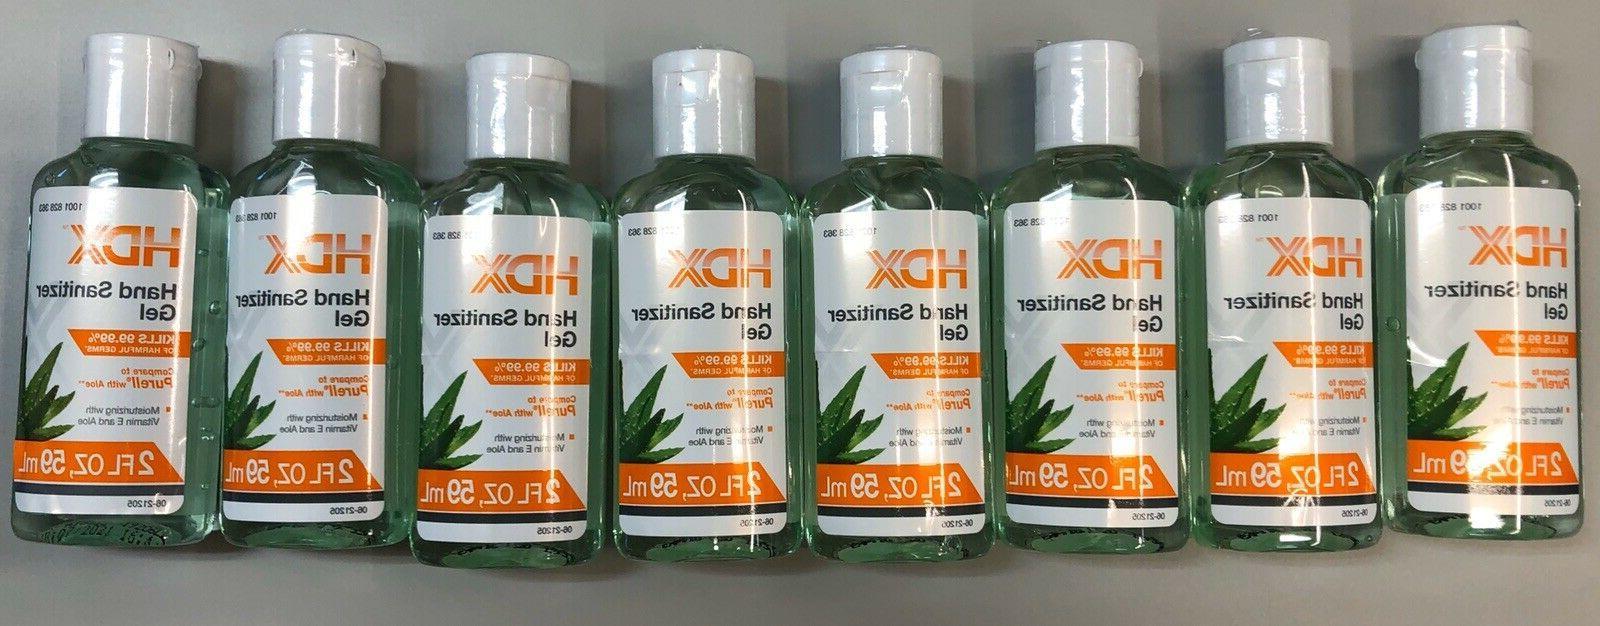 sanitizer 8 pack 70 percent alcohol kills